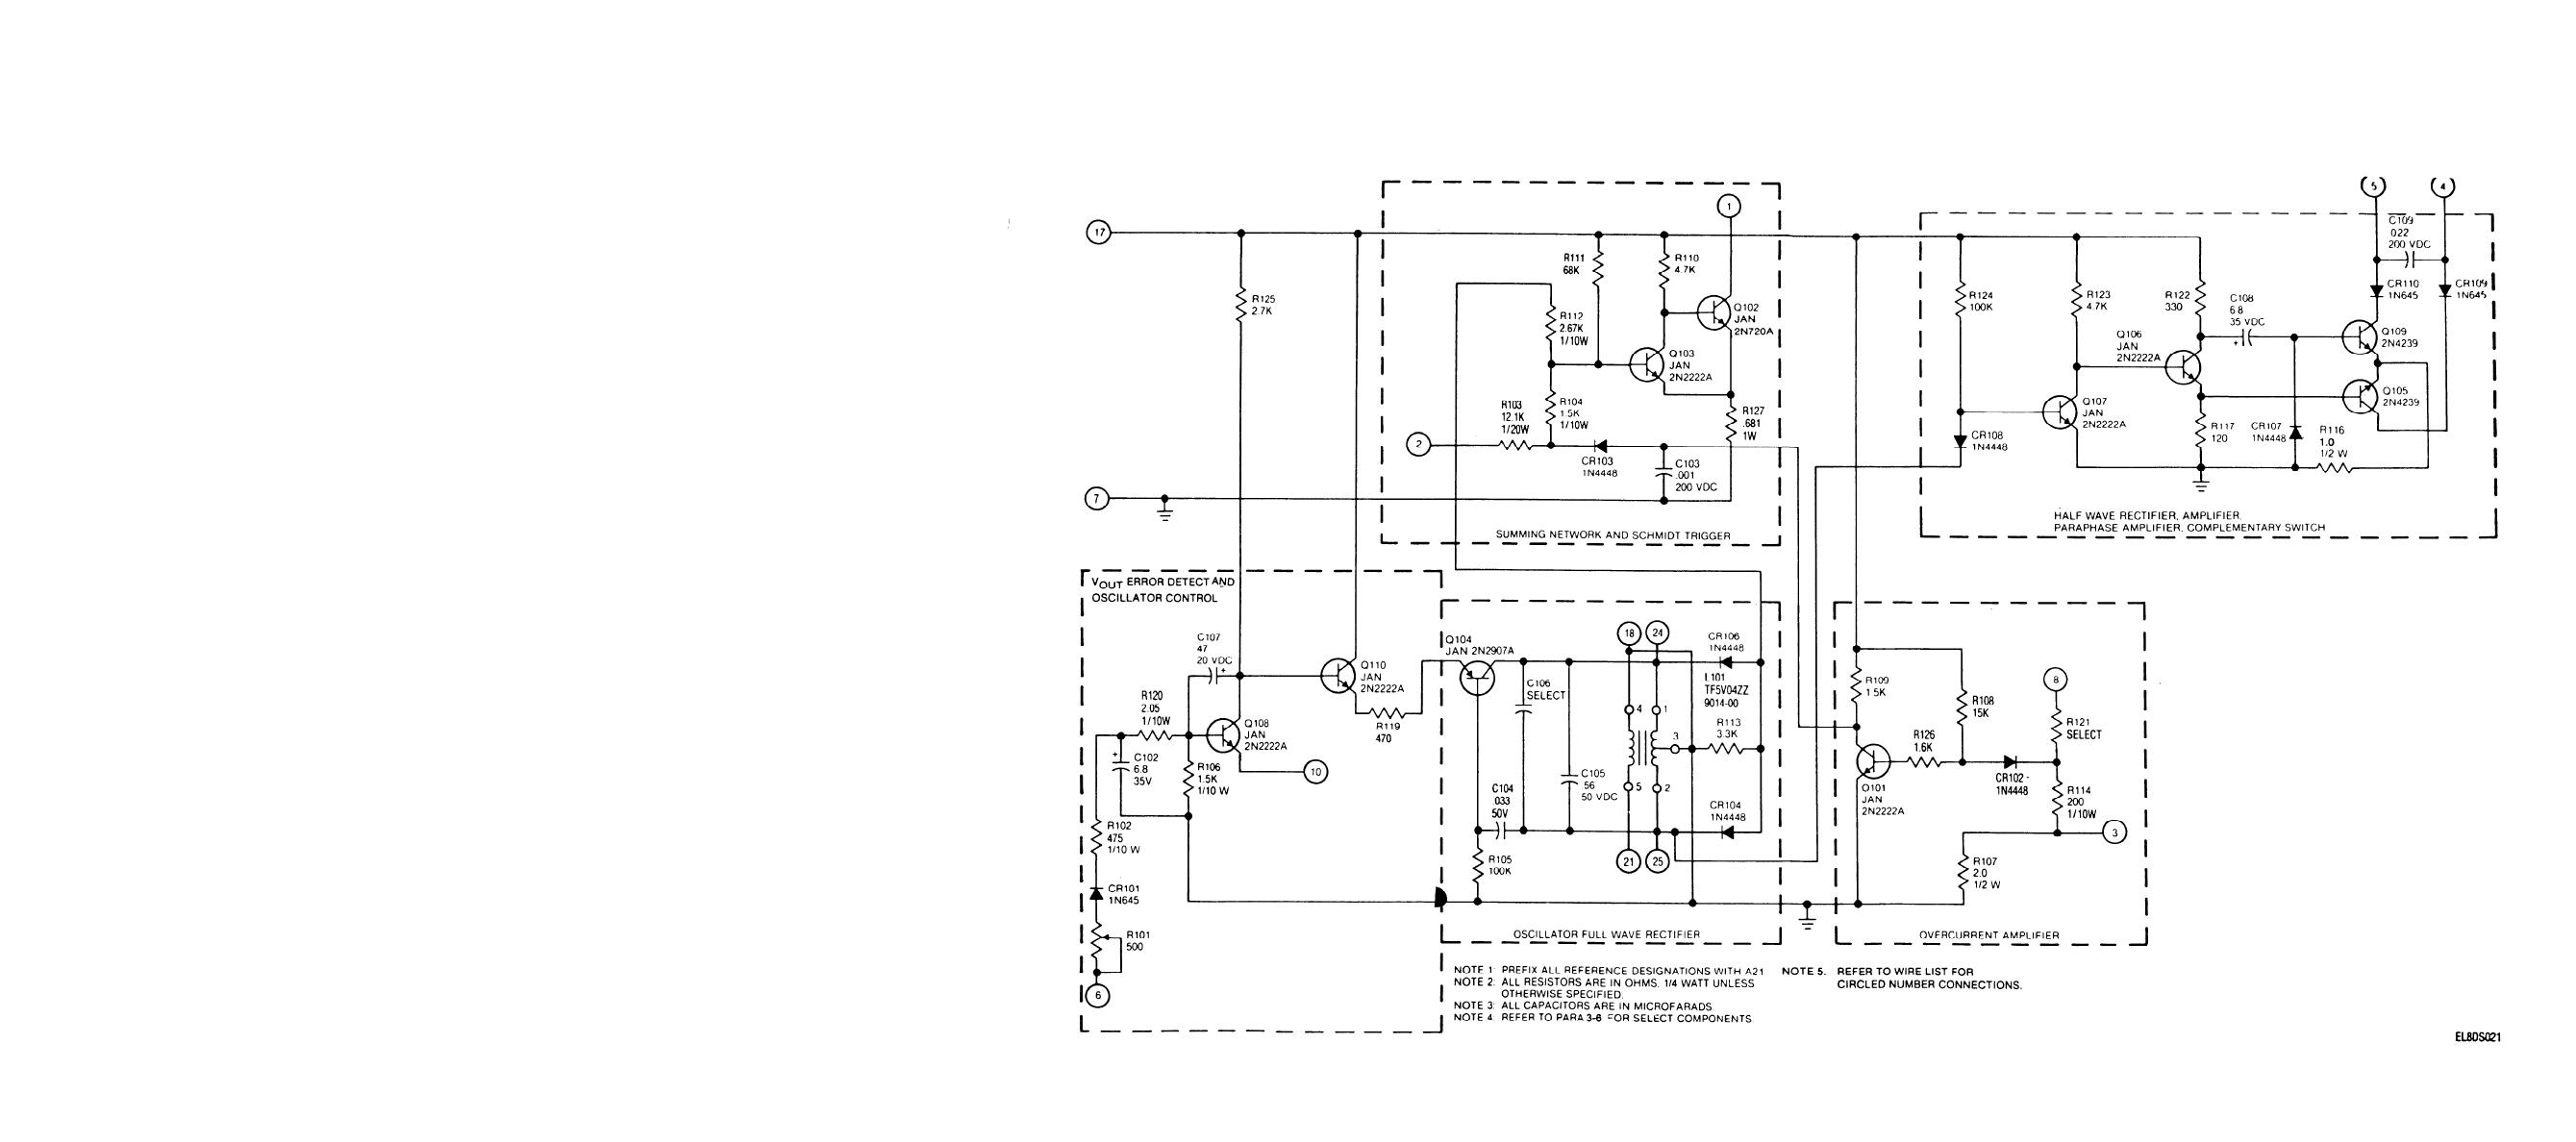 Figure Fo 4 Phase B Schematic Diagram